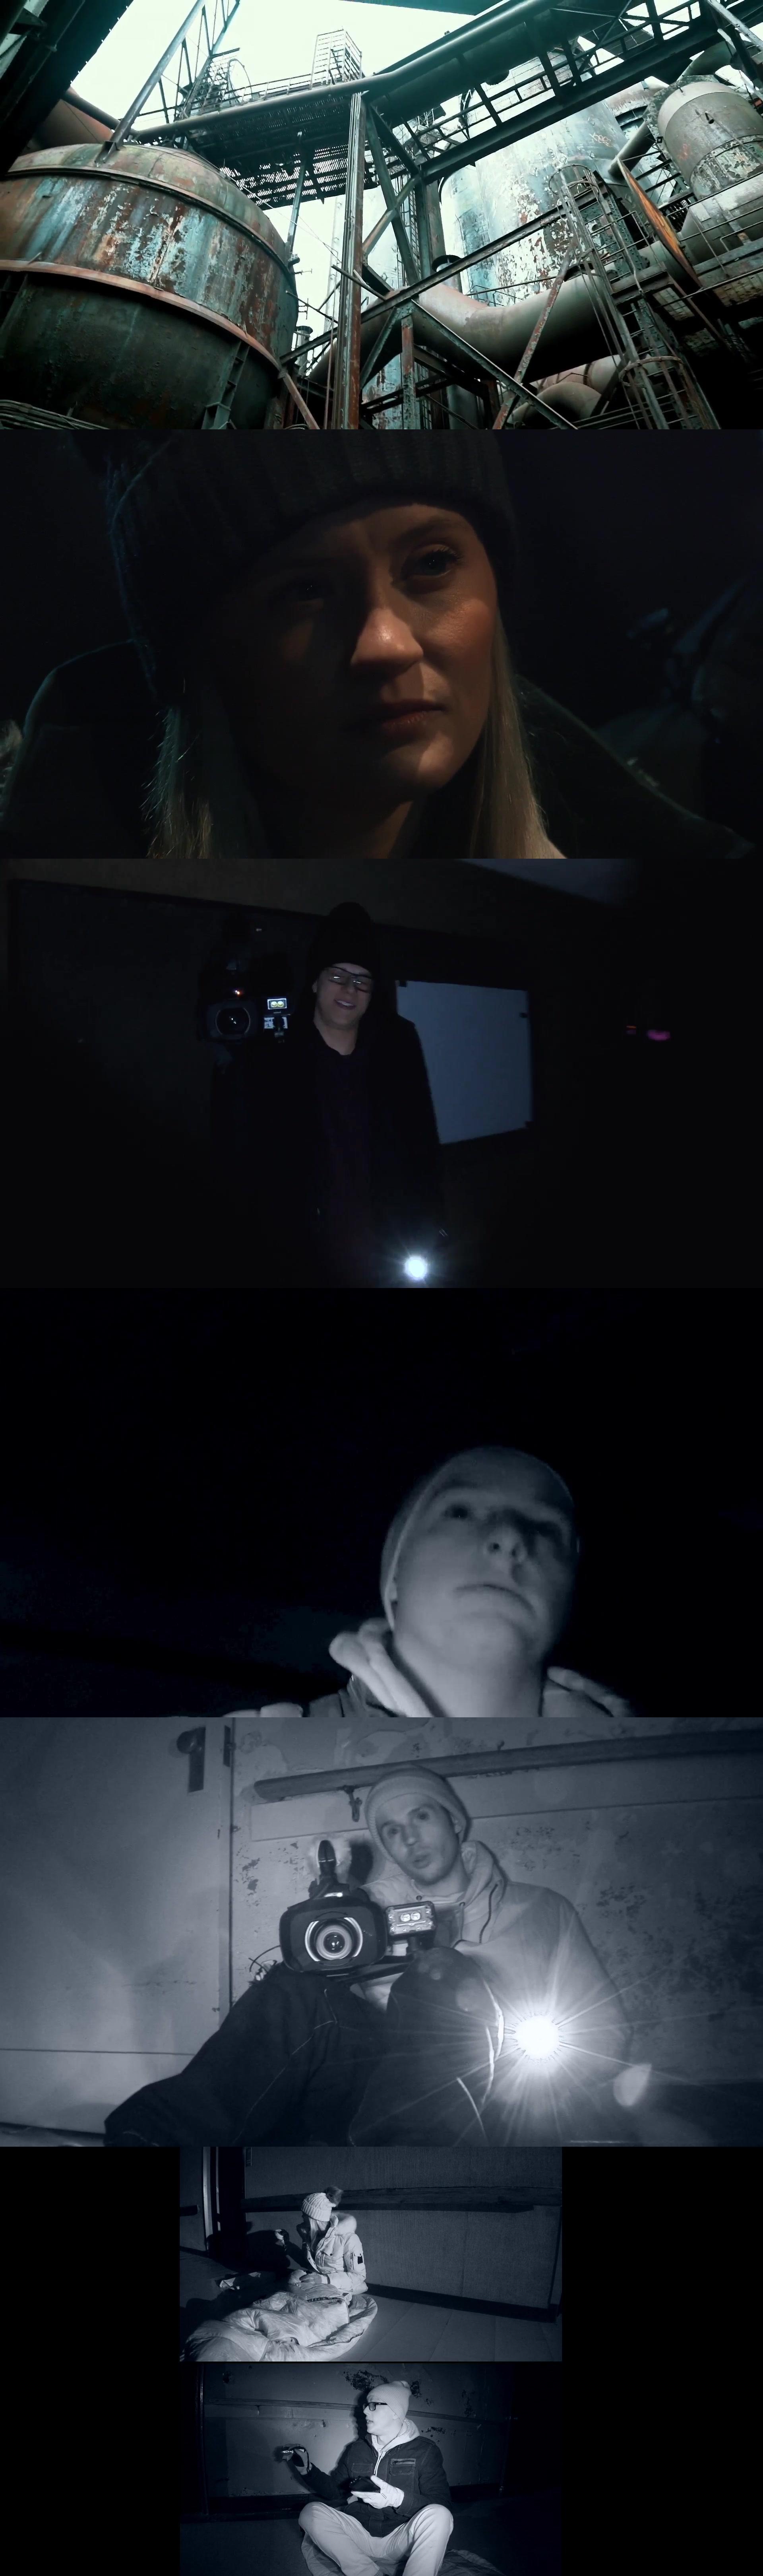 Destination Fear S02E04 Hill View Manor iNTERNAL 1080p WEB h264-ROBOTS